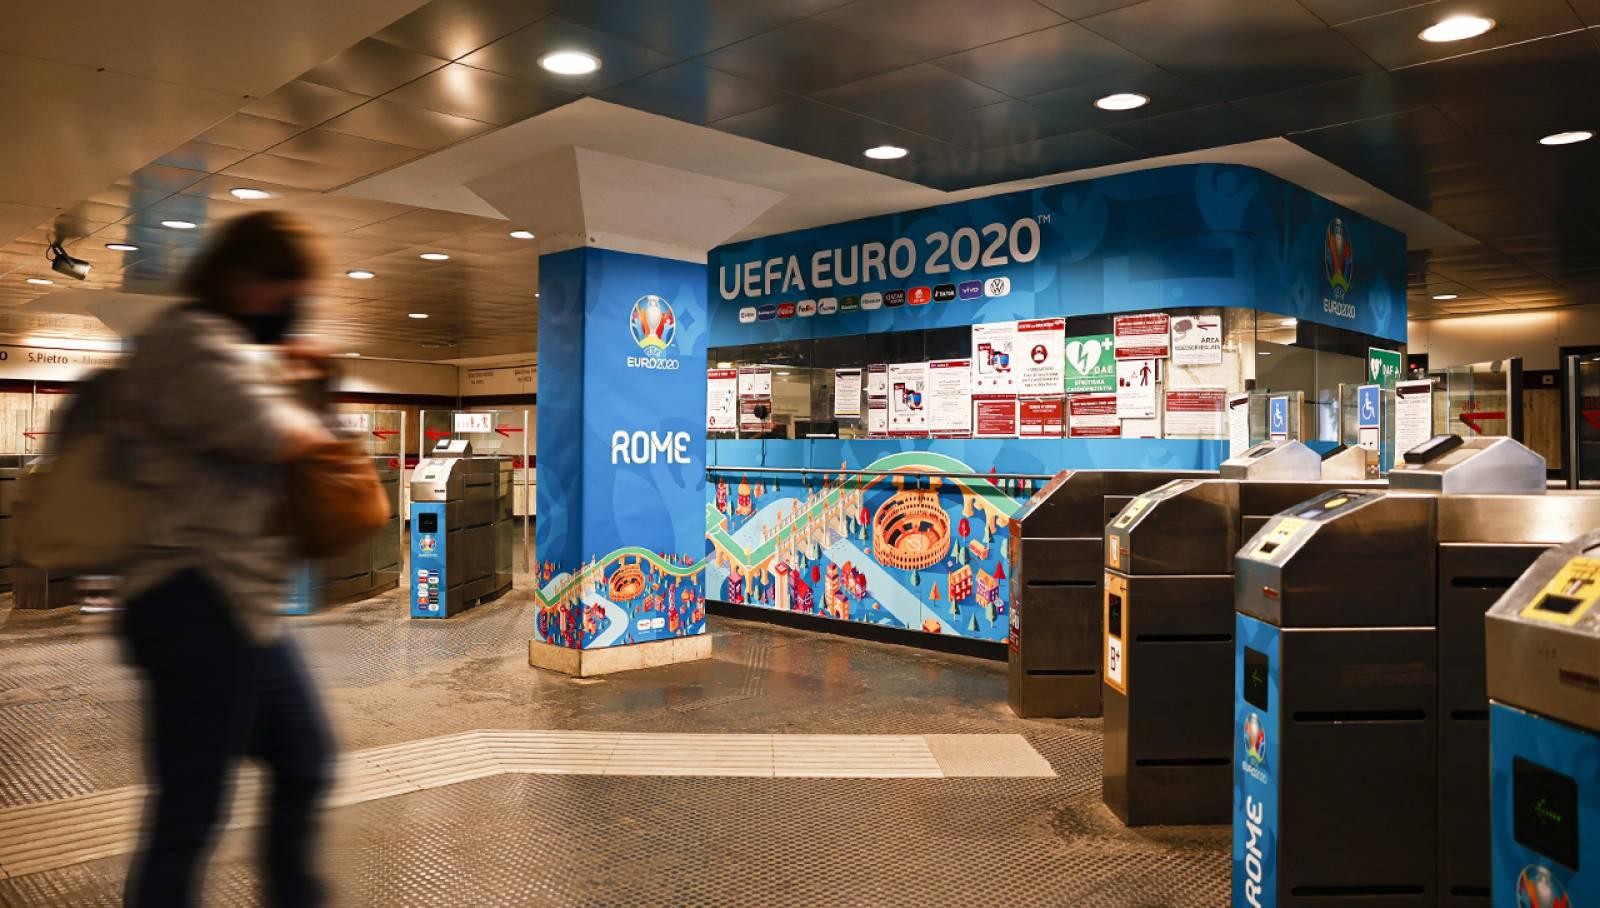 Pubblicità in metropolitana a Roma IGPDecaux Station Domination per UEFA 2020